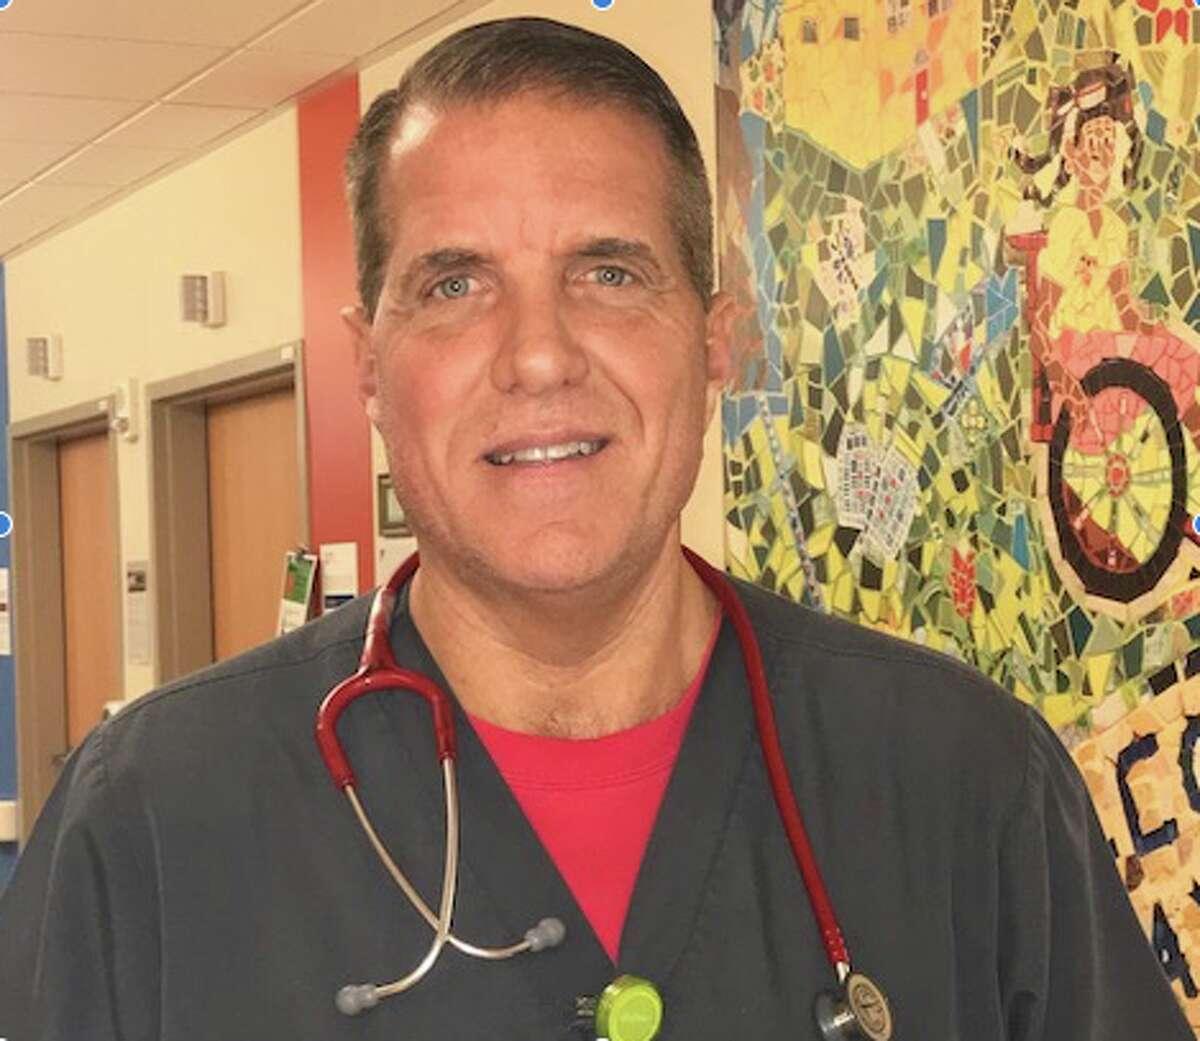 Kaiser nurse Tom Fowkes works in Oakland but lives in Monongahela, Pennsylvania.